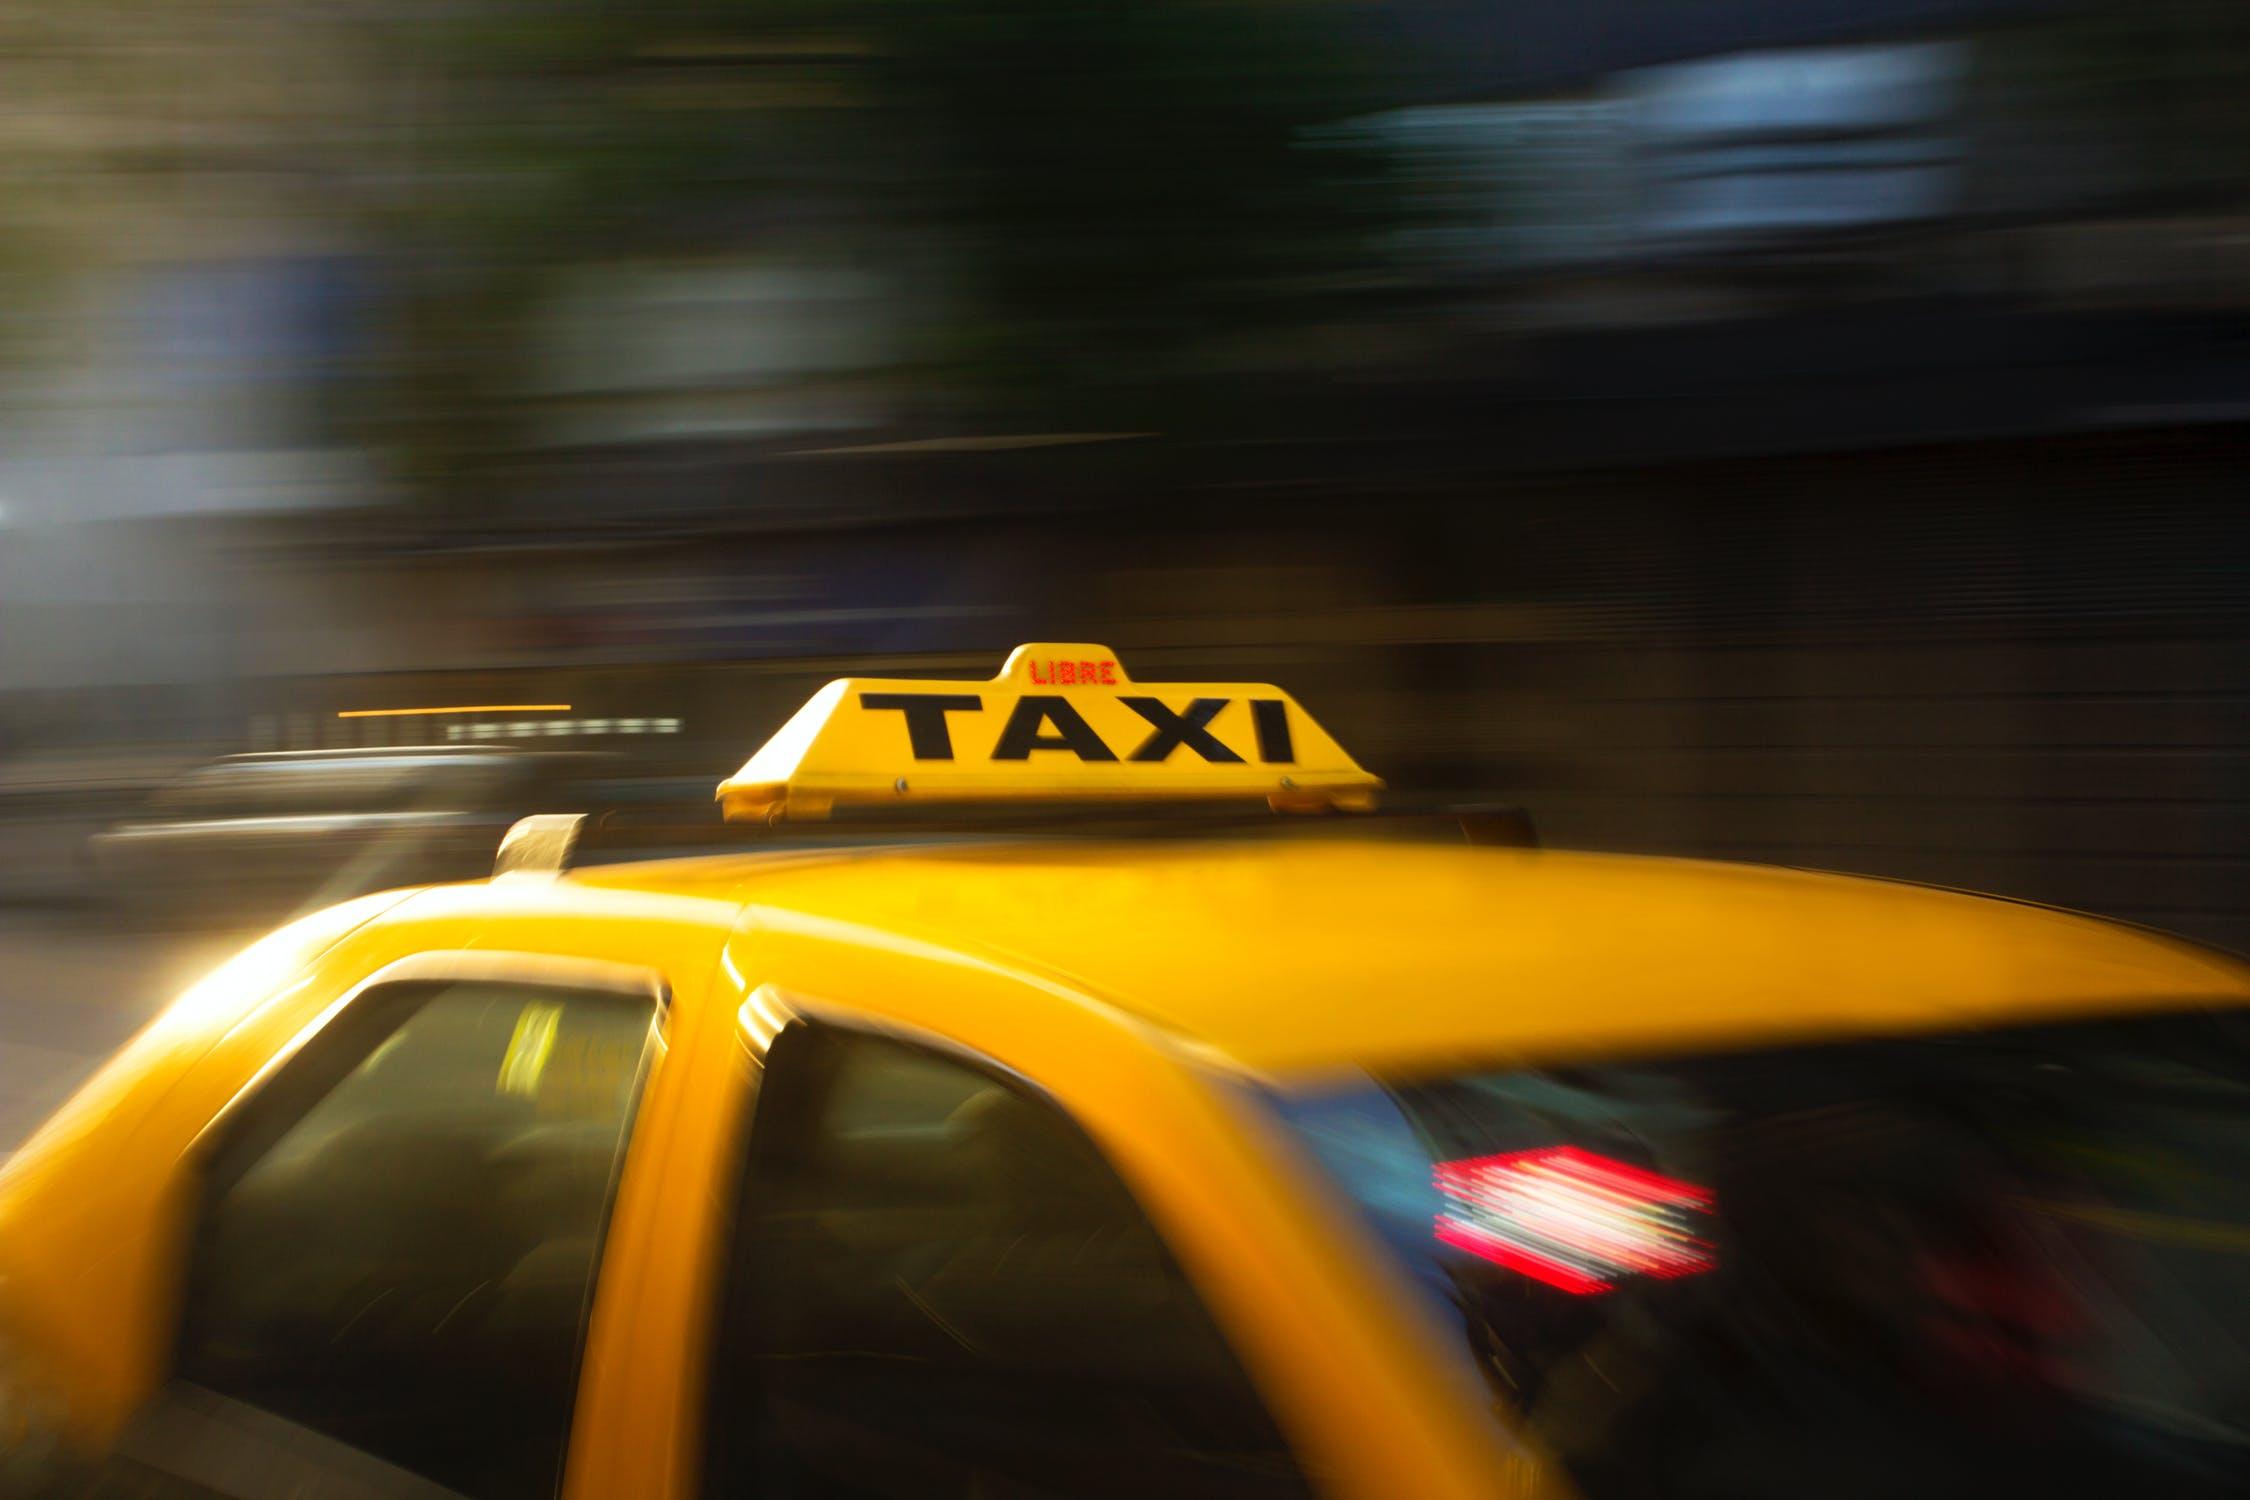 patente-kb-taxi-ncc